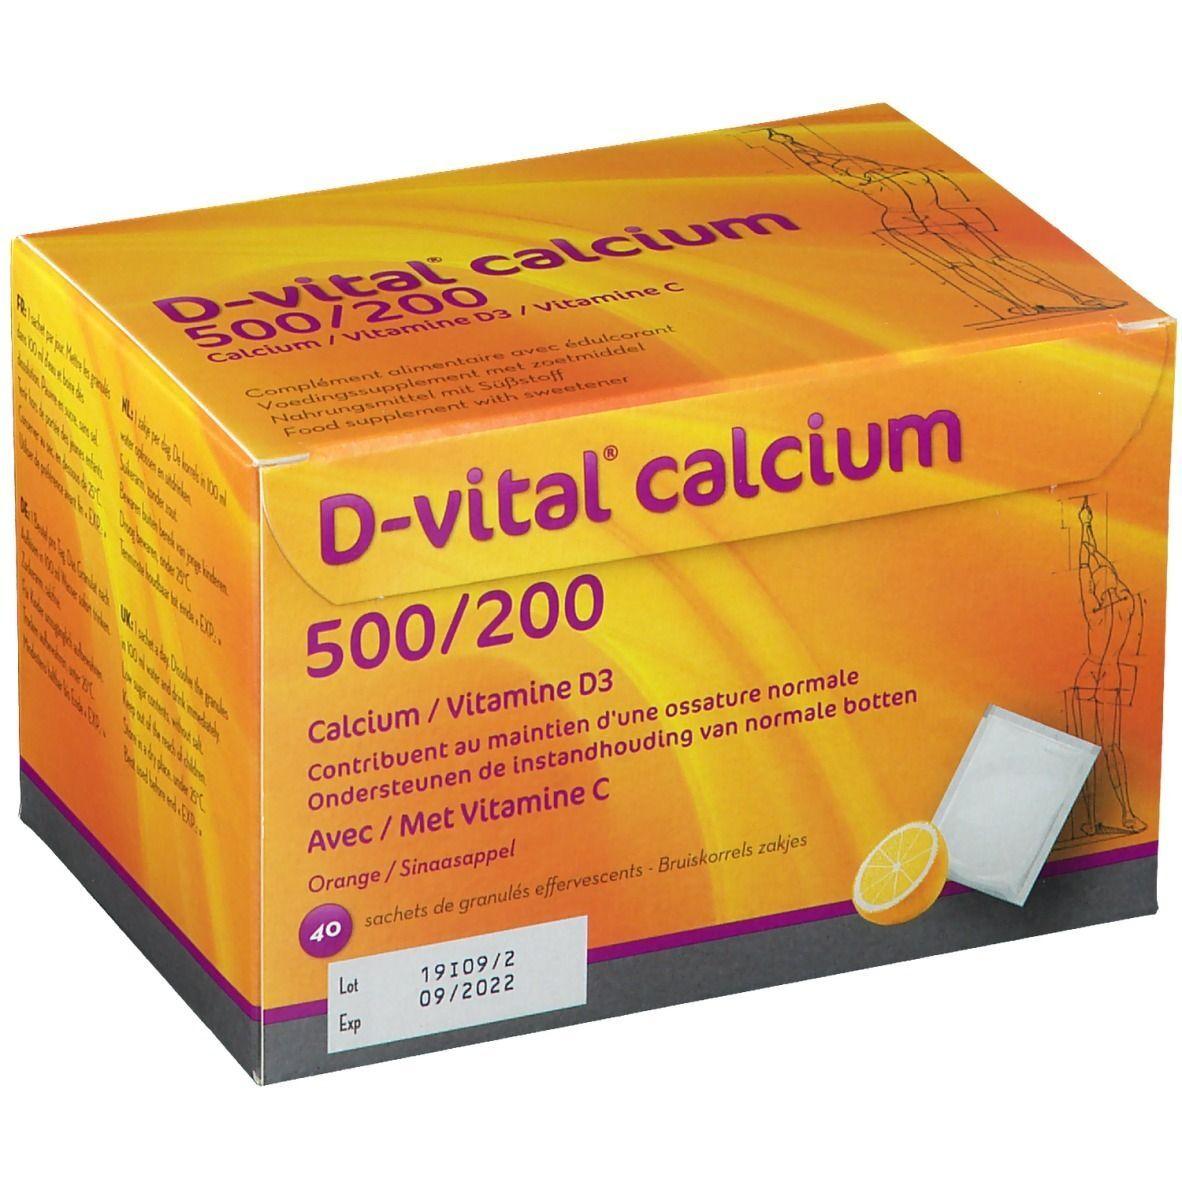 D-vital® calcium 500/200 goût orange pc(s) sachet(s)